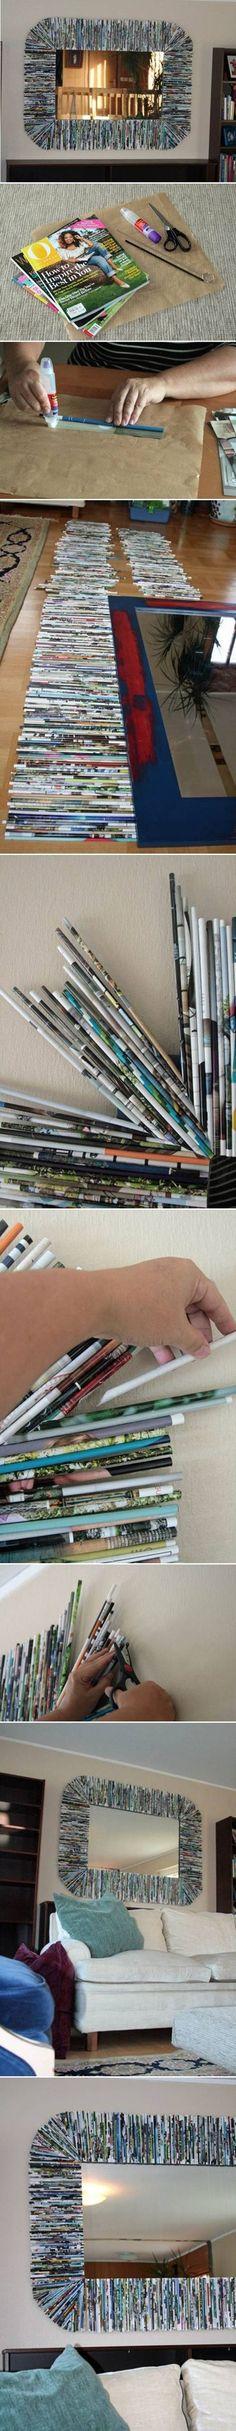 DIY Recycle Magazine Mirror Frame